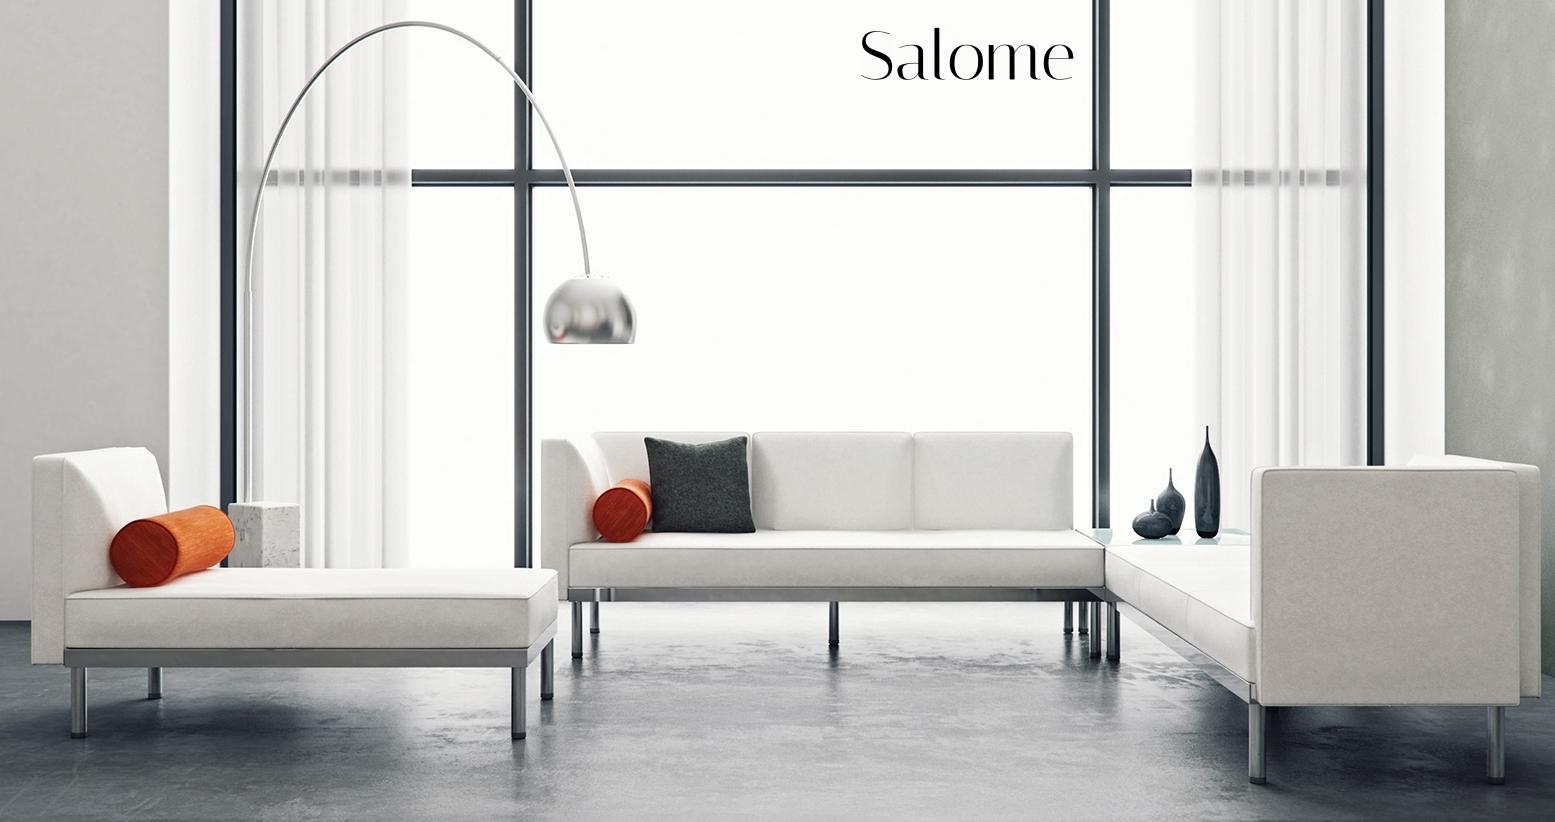 Salome Series